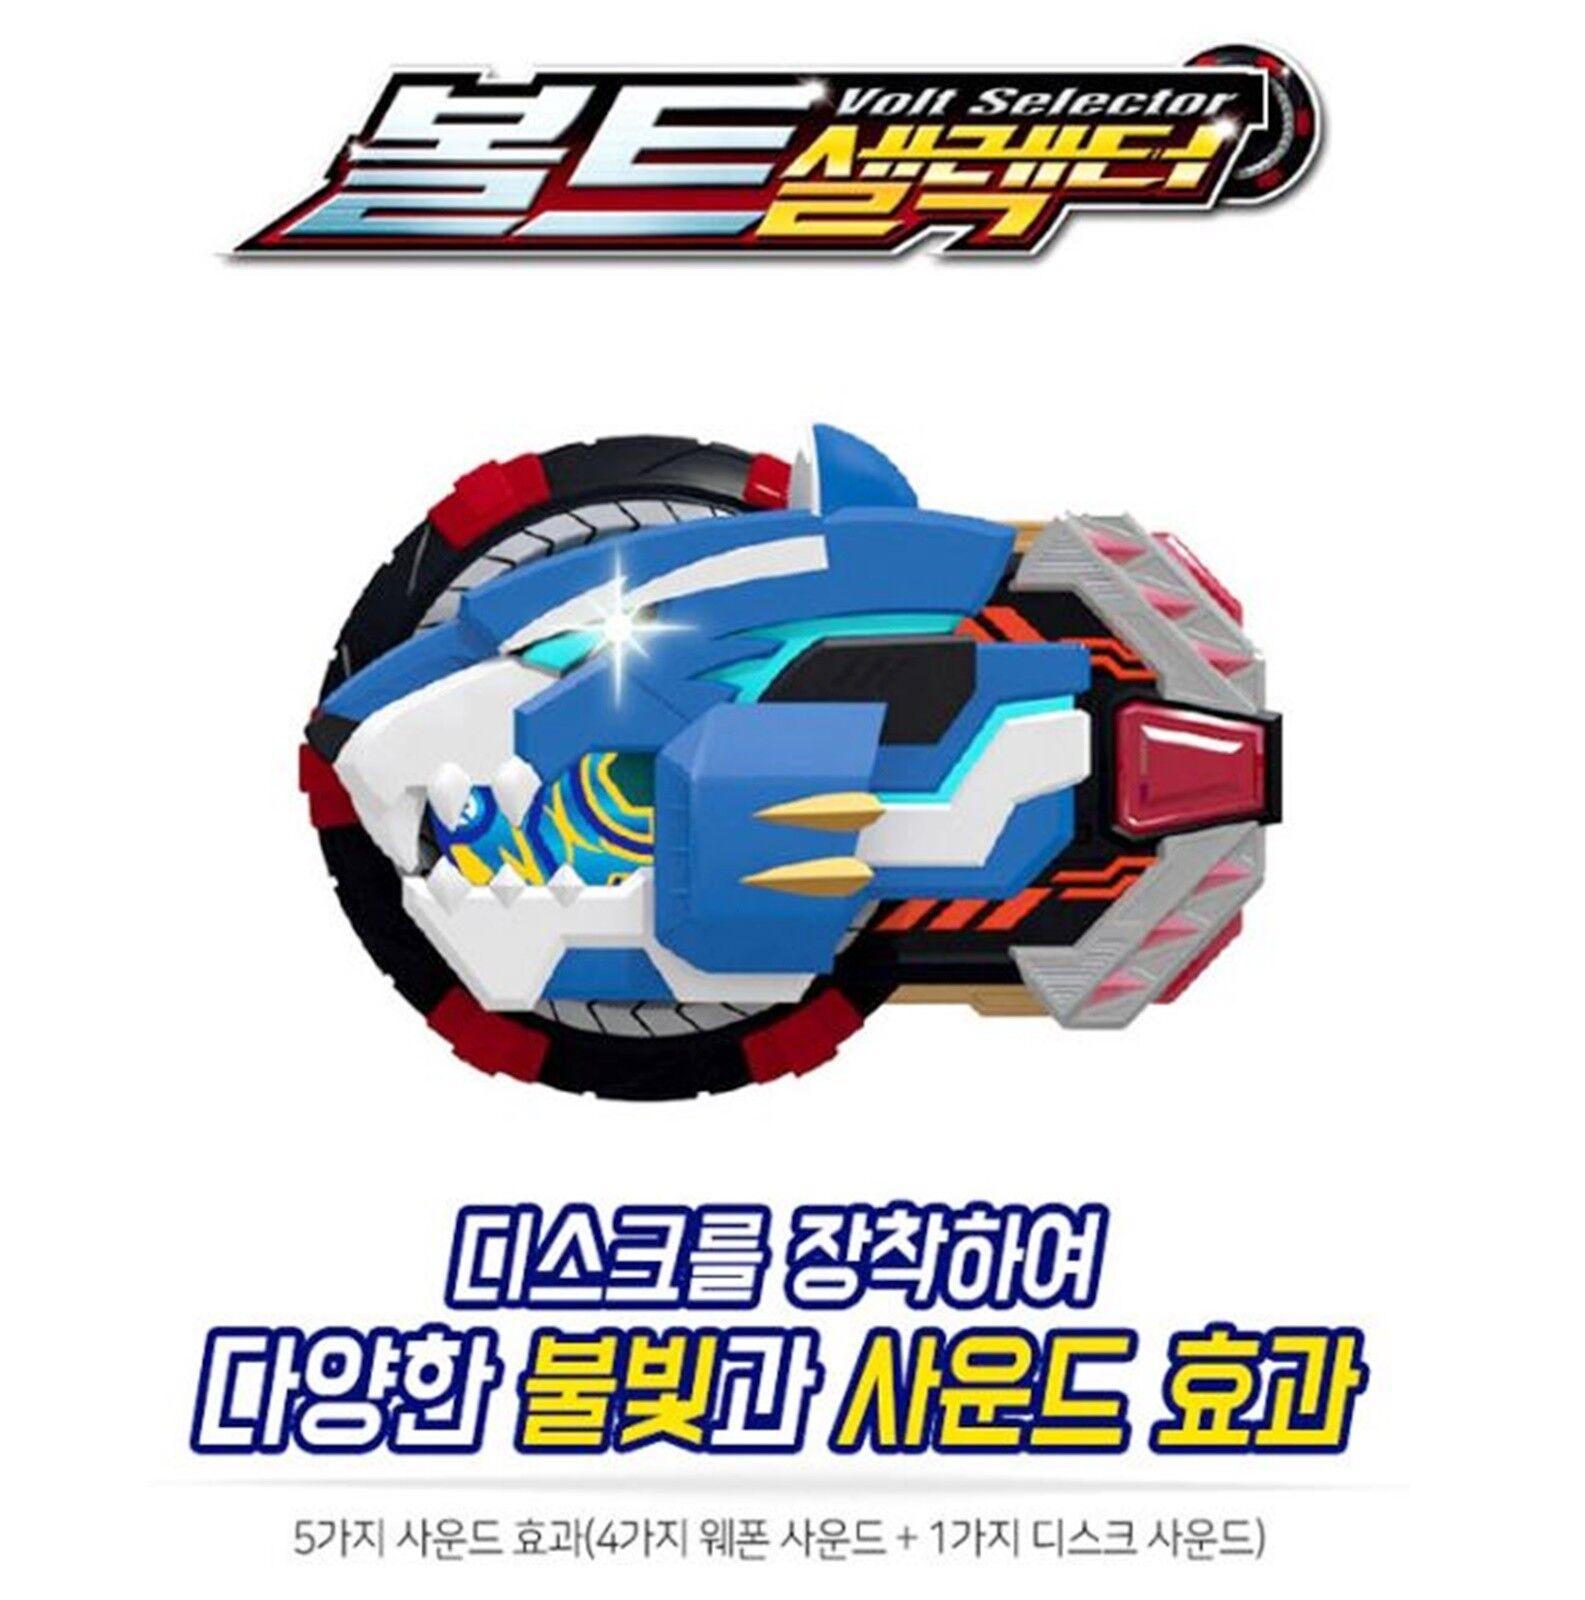 MINIFORCE MINI FORCE X  BOLT VOLT SELECTOR + + + Extra 6 Disks  bluee Disk Play Toy 554a09